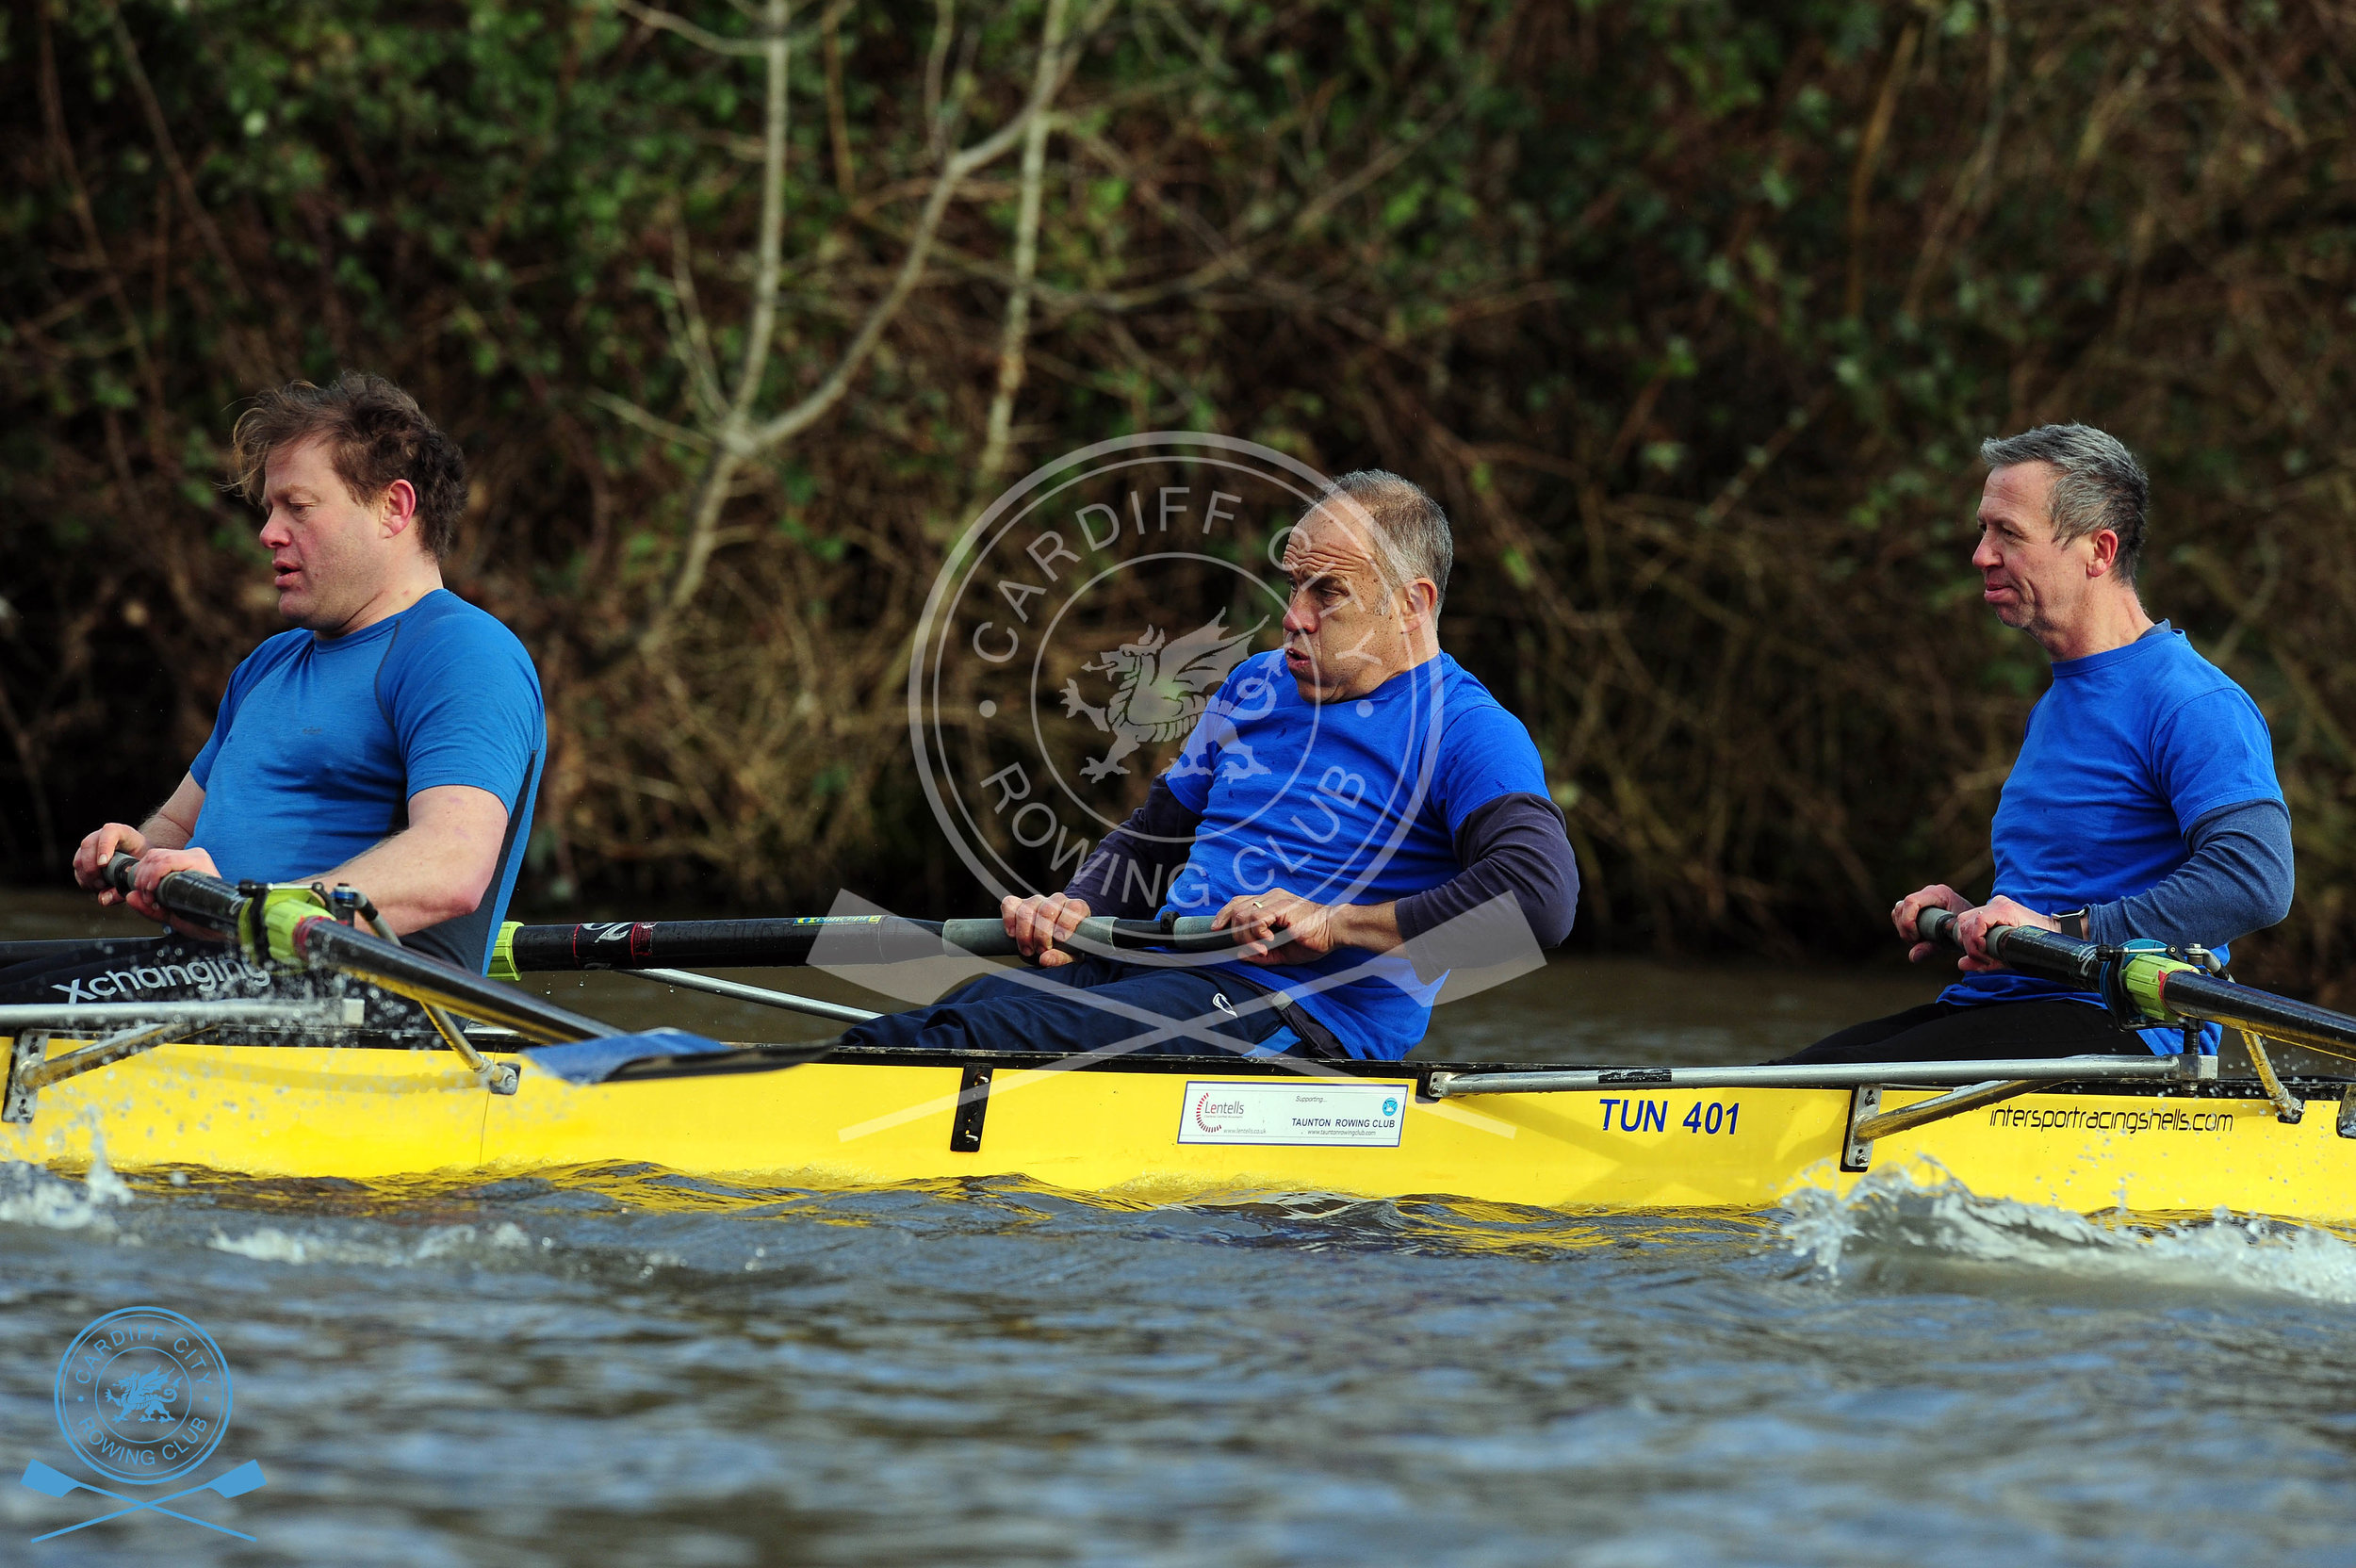 DW_280119_Cardiff_City_Rowing_270.jpg